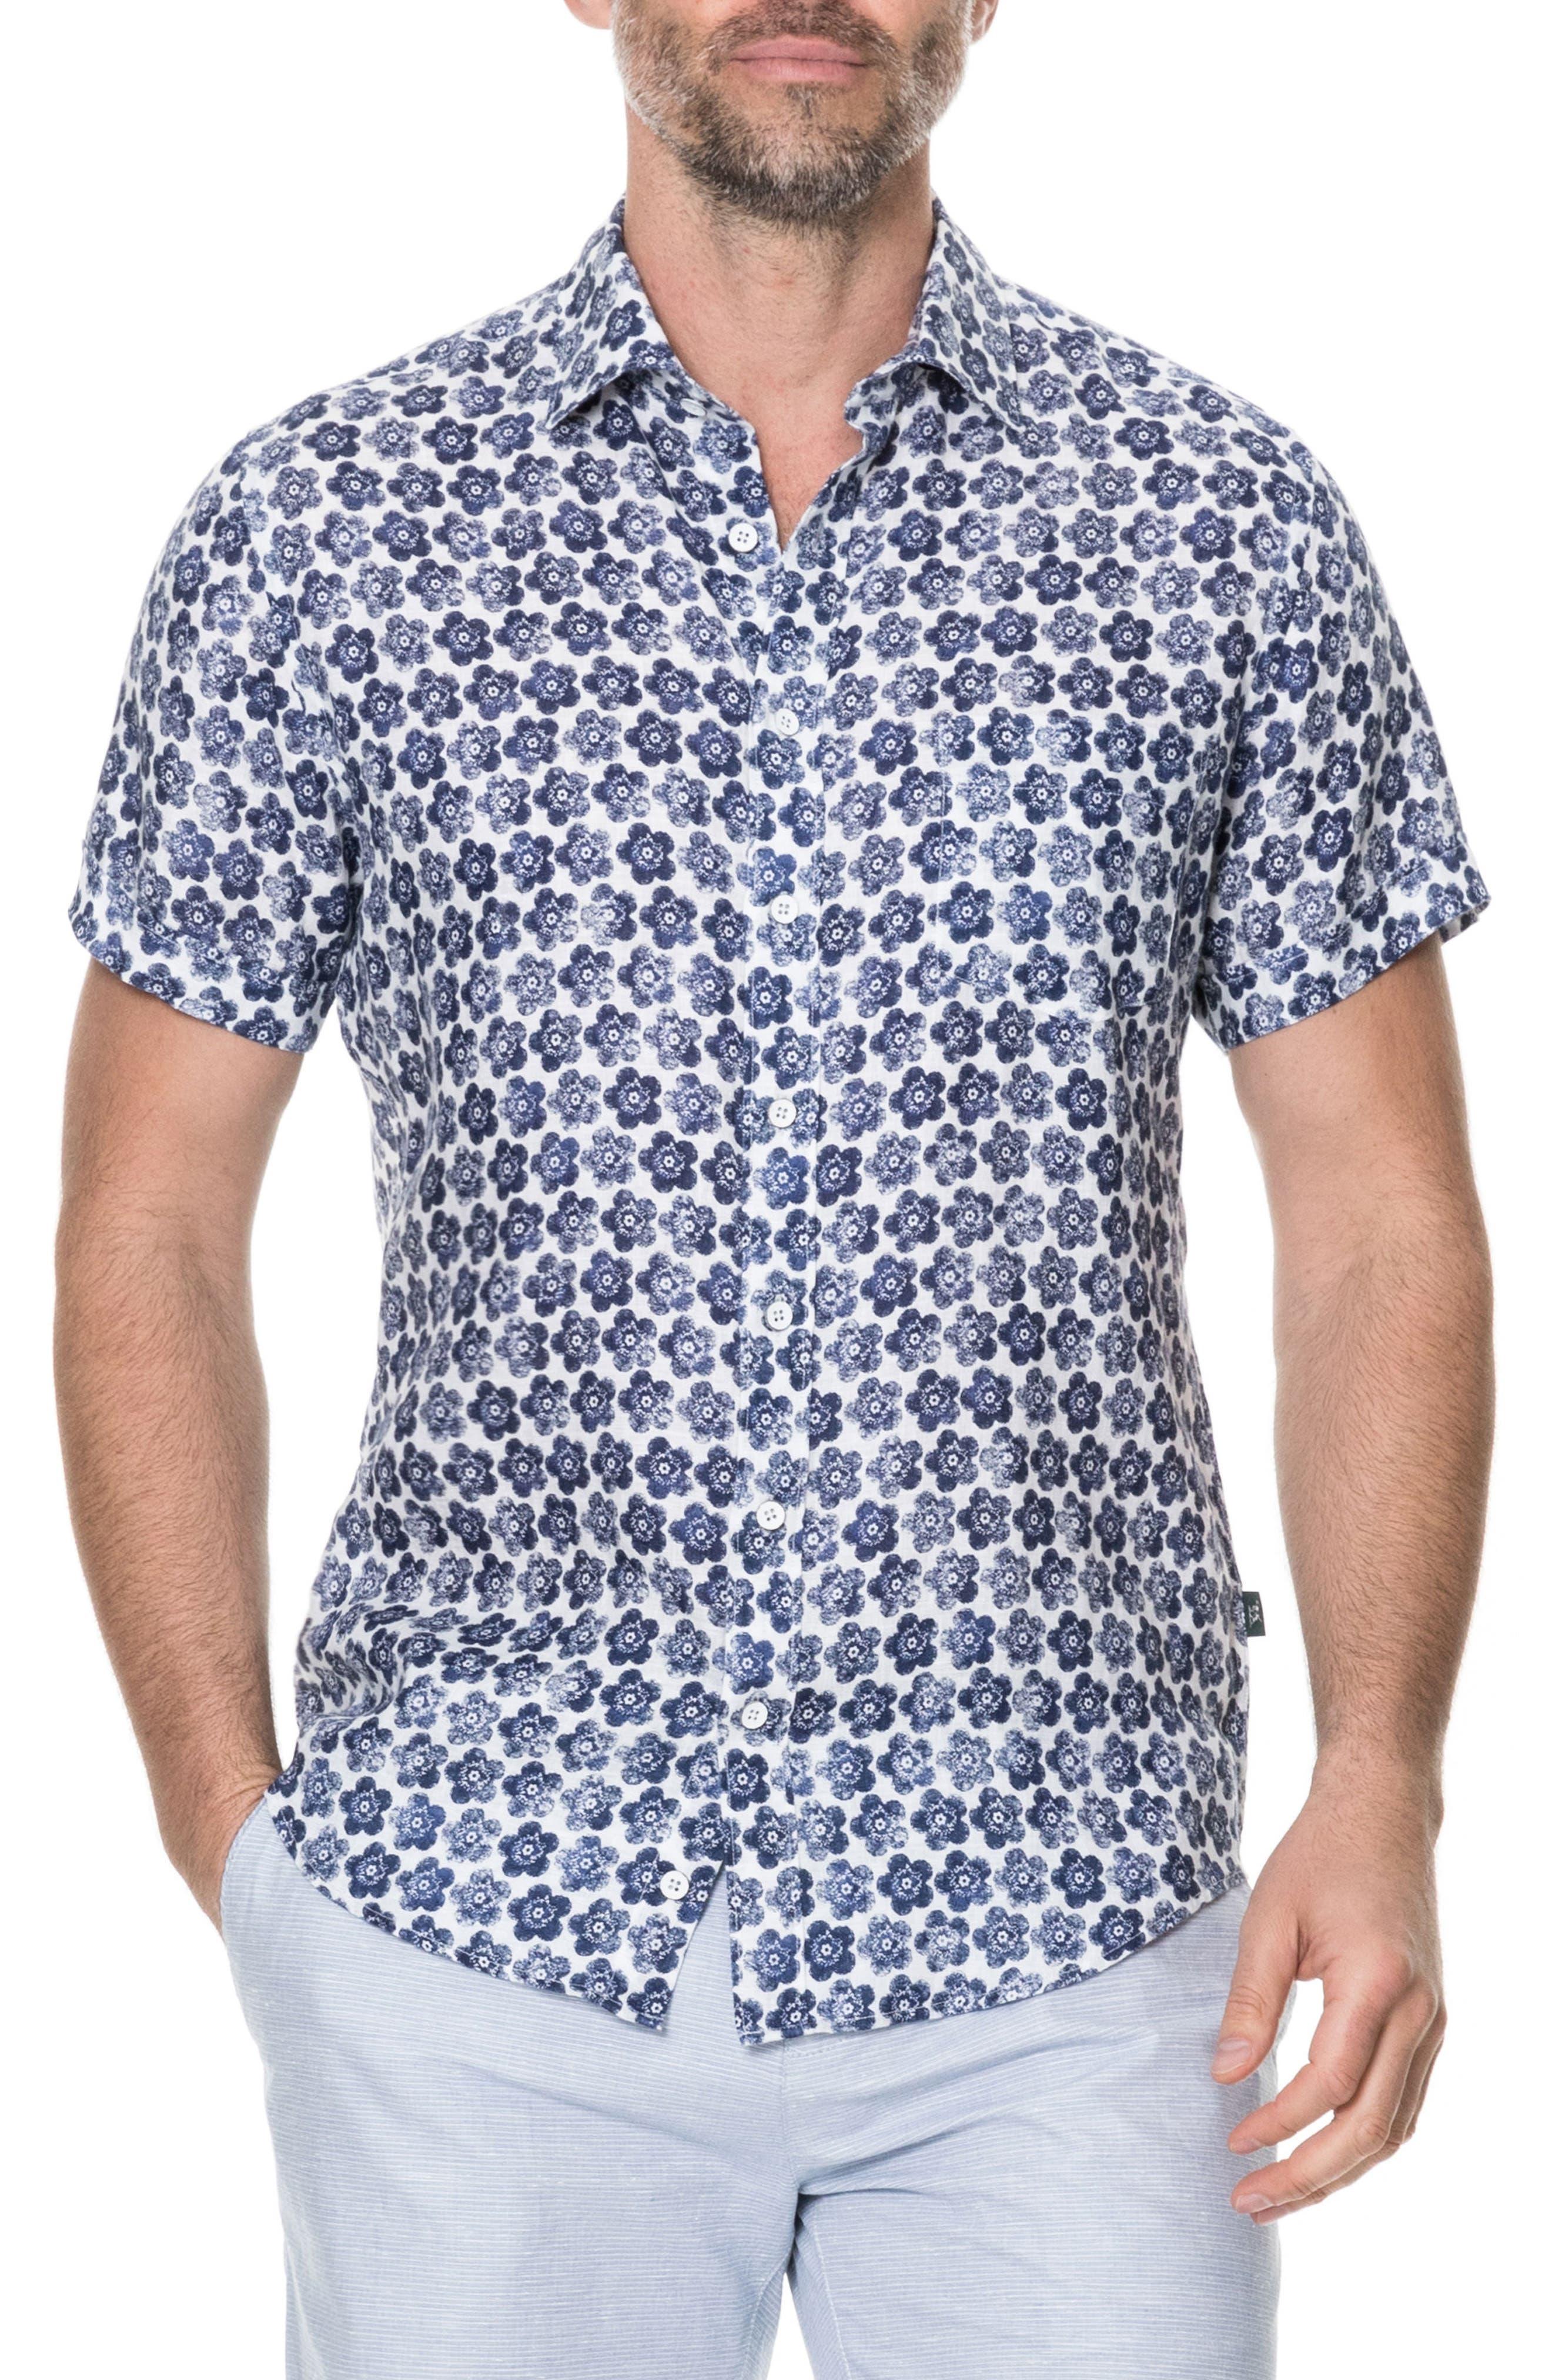 Keyburn Regular Fit Sport Shirt,                             Main thumbnail 1, color,                             PEACOAT